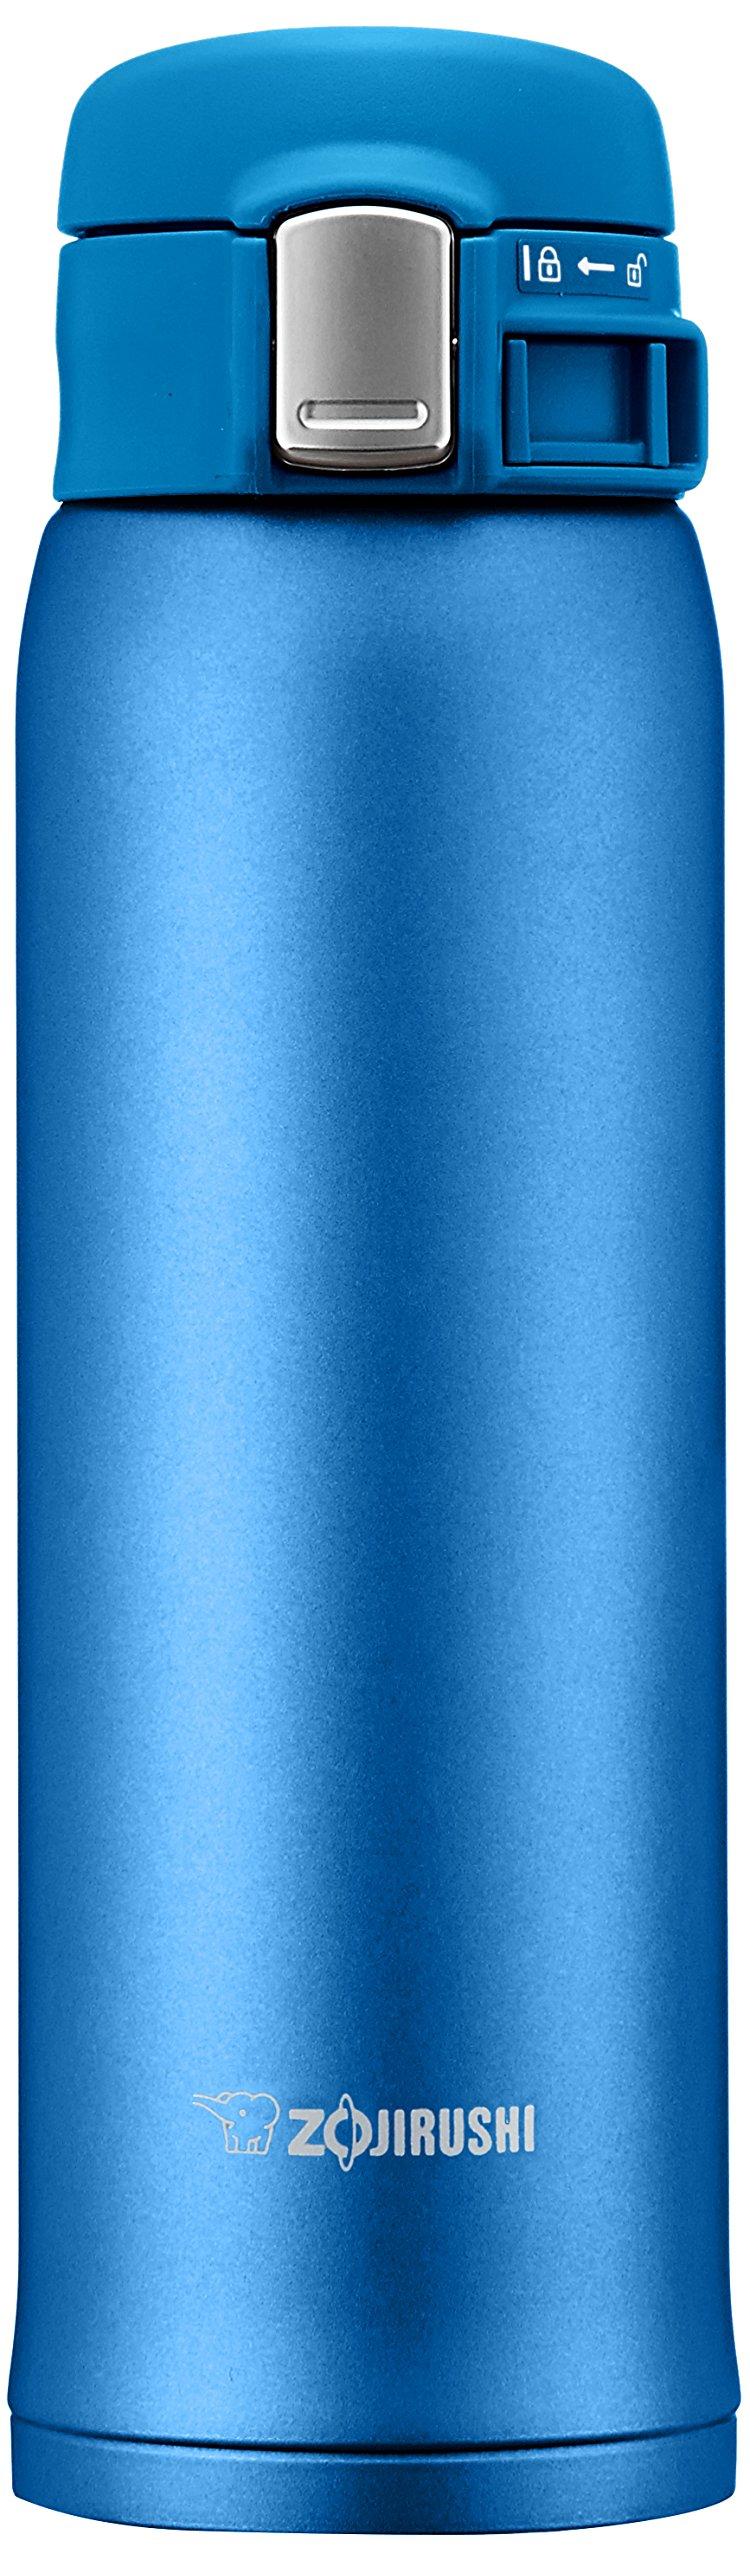 Zojirushi SM-SD48AM Stainless Steel Mug, 16-Ounce, Matte Blue